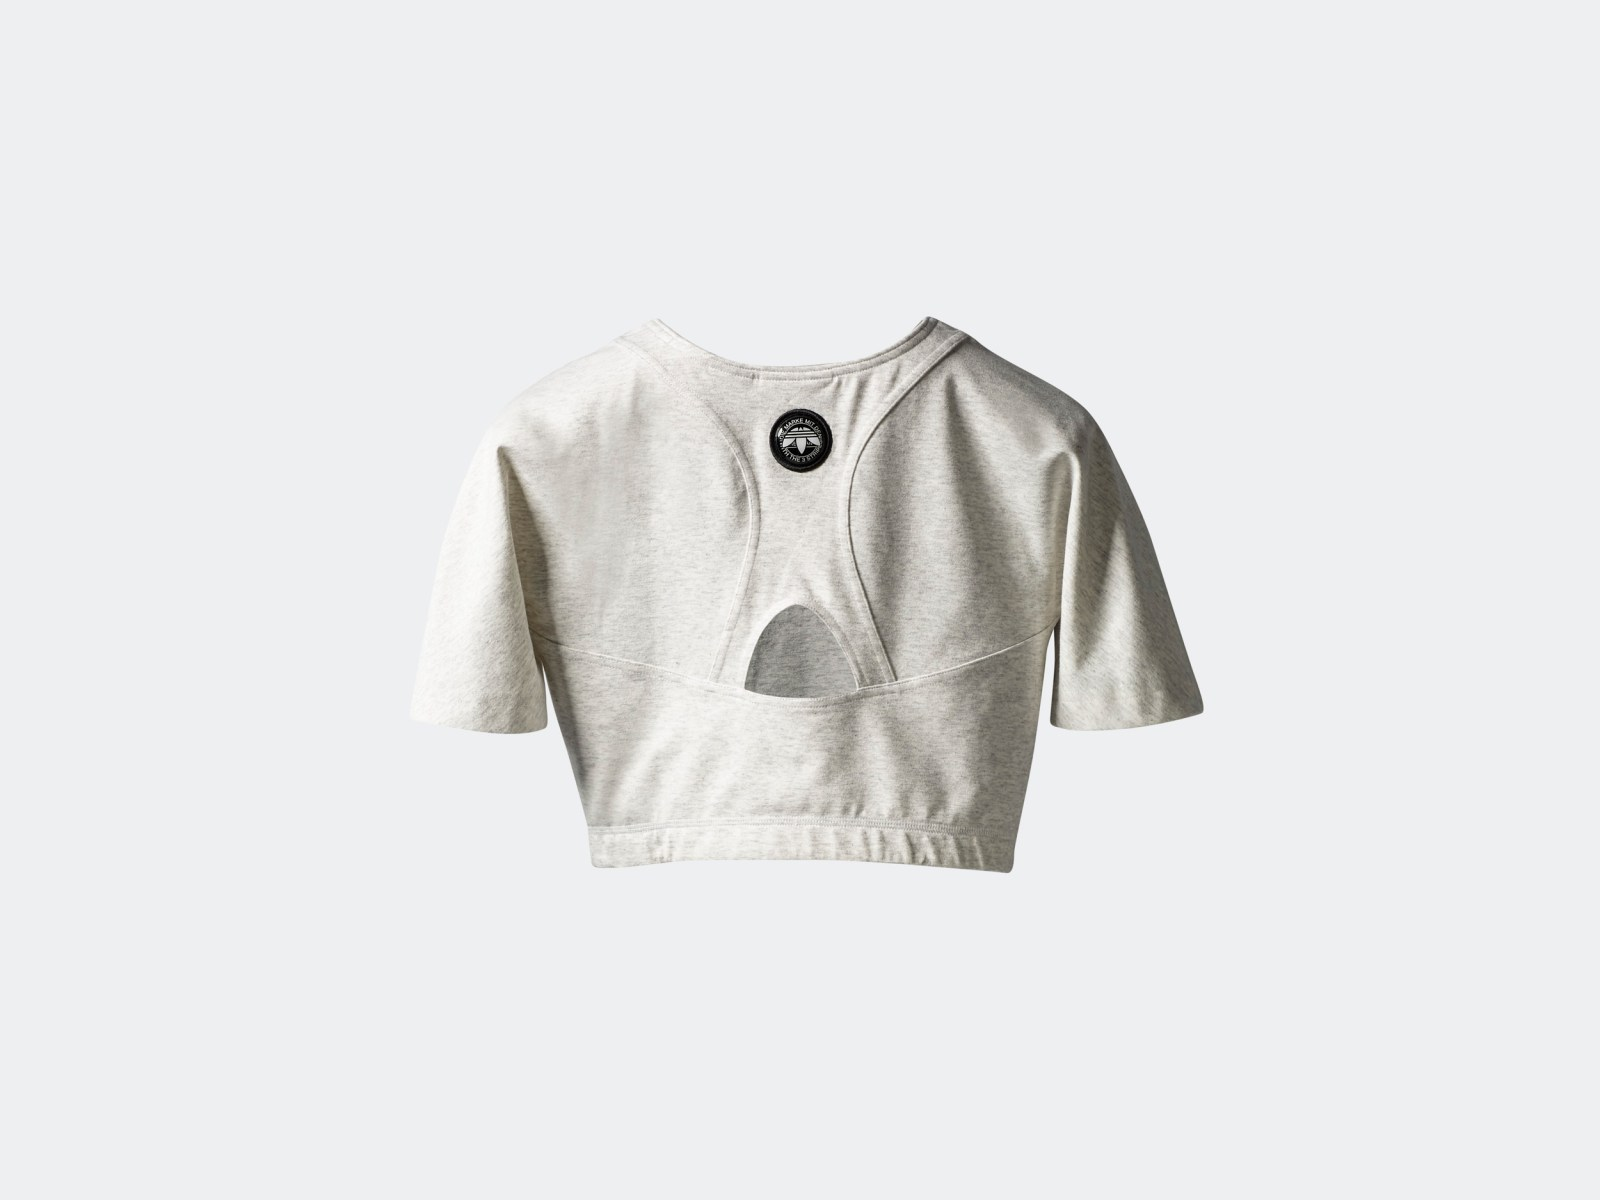 adidas Originals by Alexander Wang 聯乘系列 Season 5 正式發佈